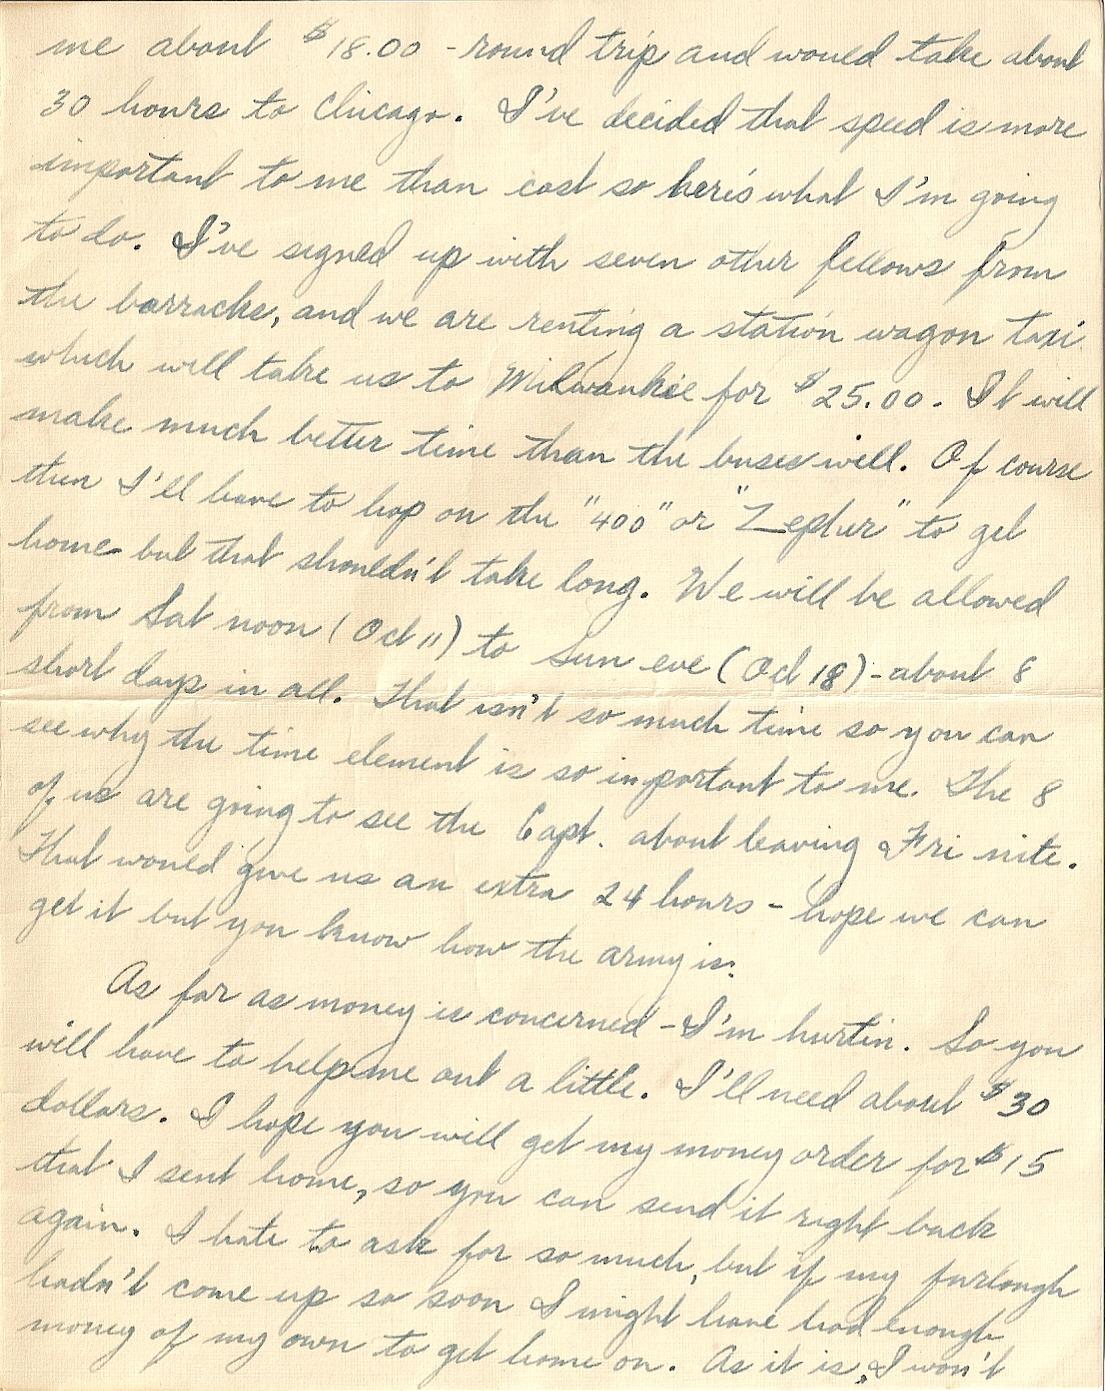 09.28.1941c.jpg